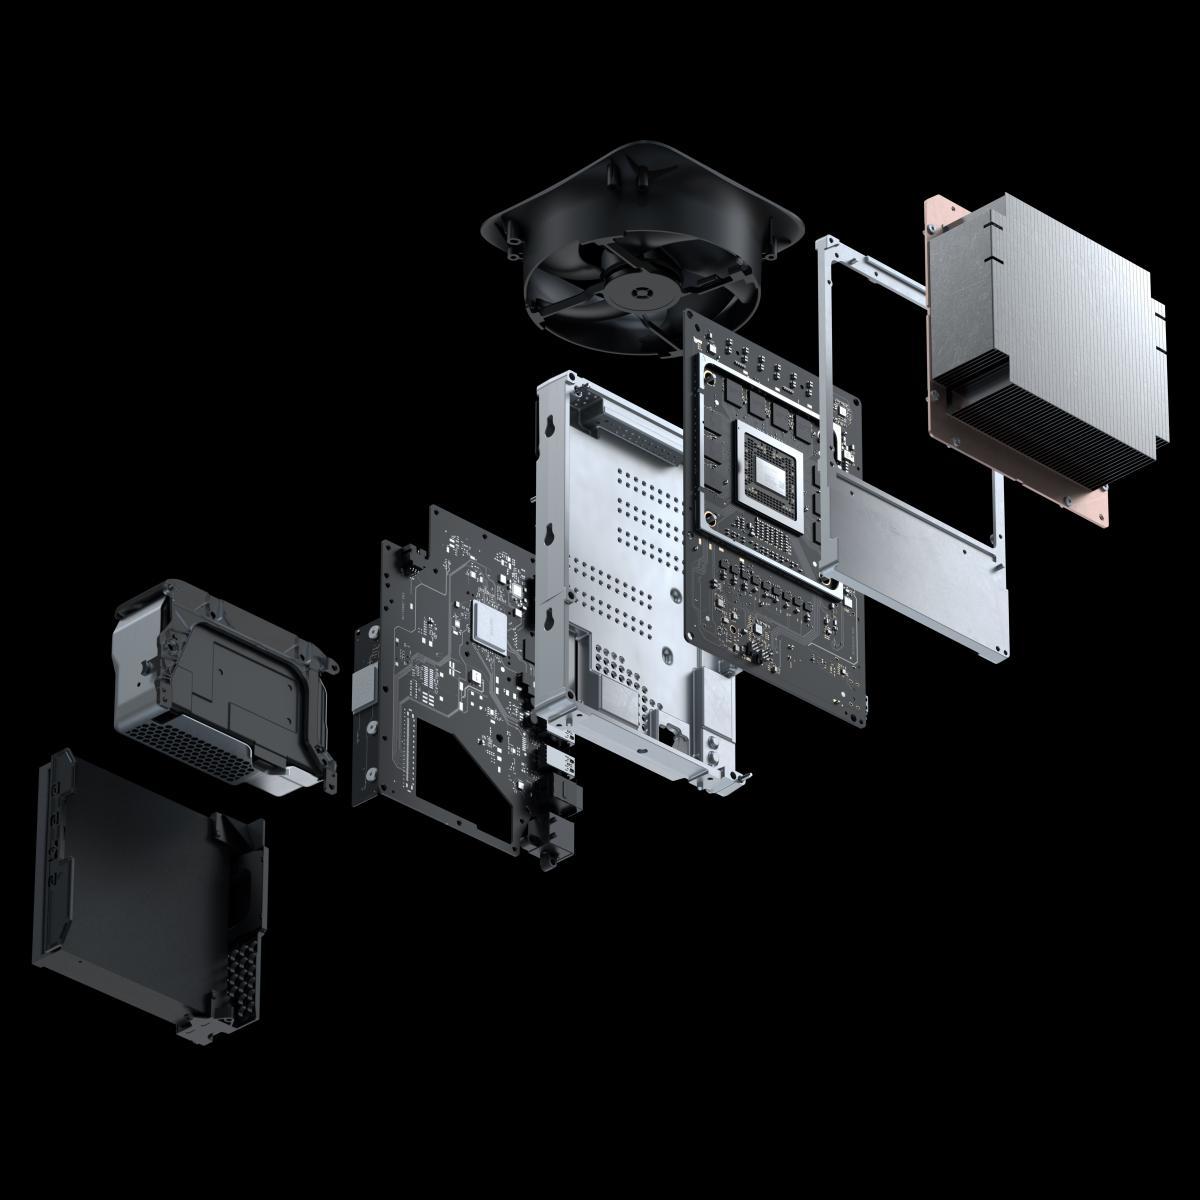 Все компоненты Xbox Series X / news.xbox.com